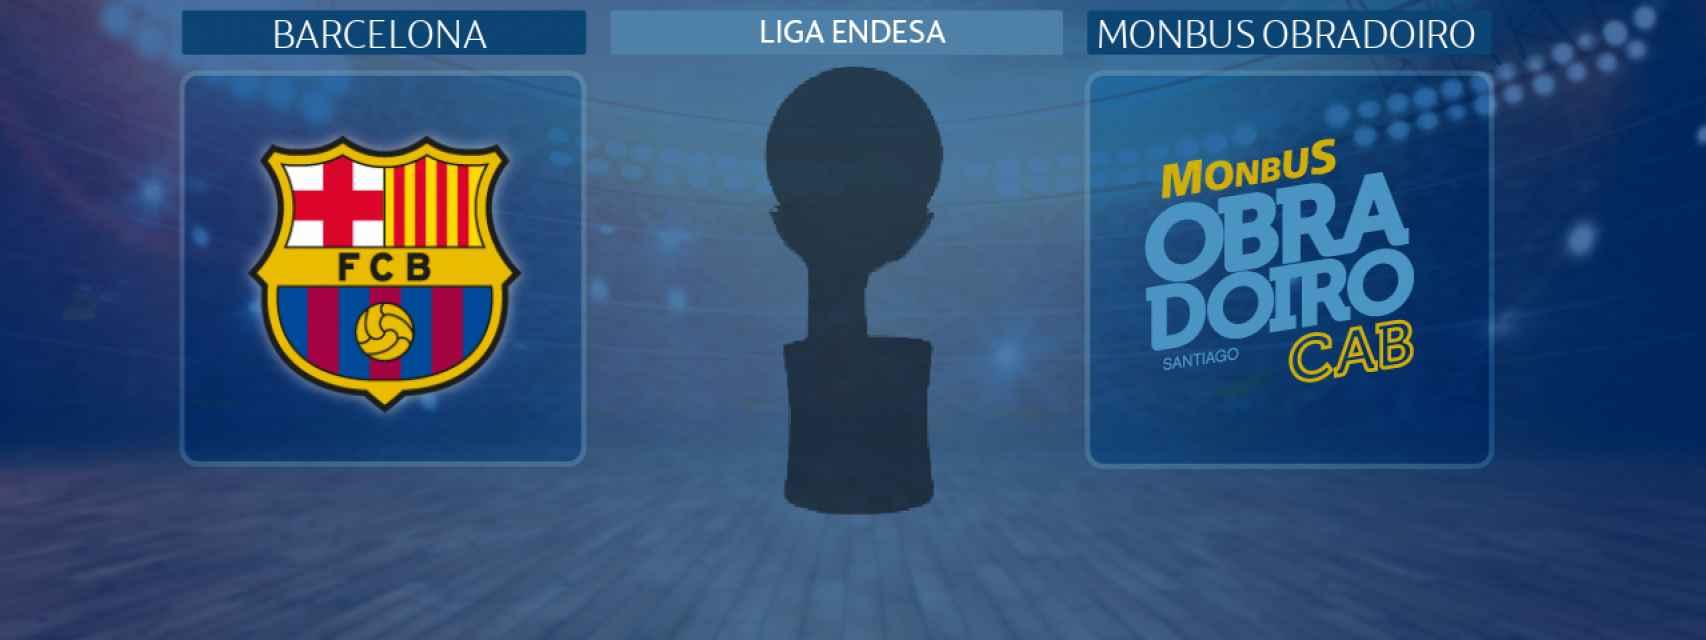 Barcelona - Monbus Obradoiro, partido de la Liga Endesa